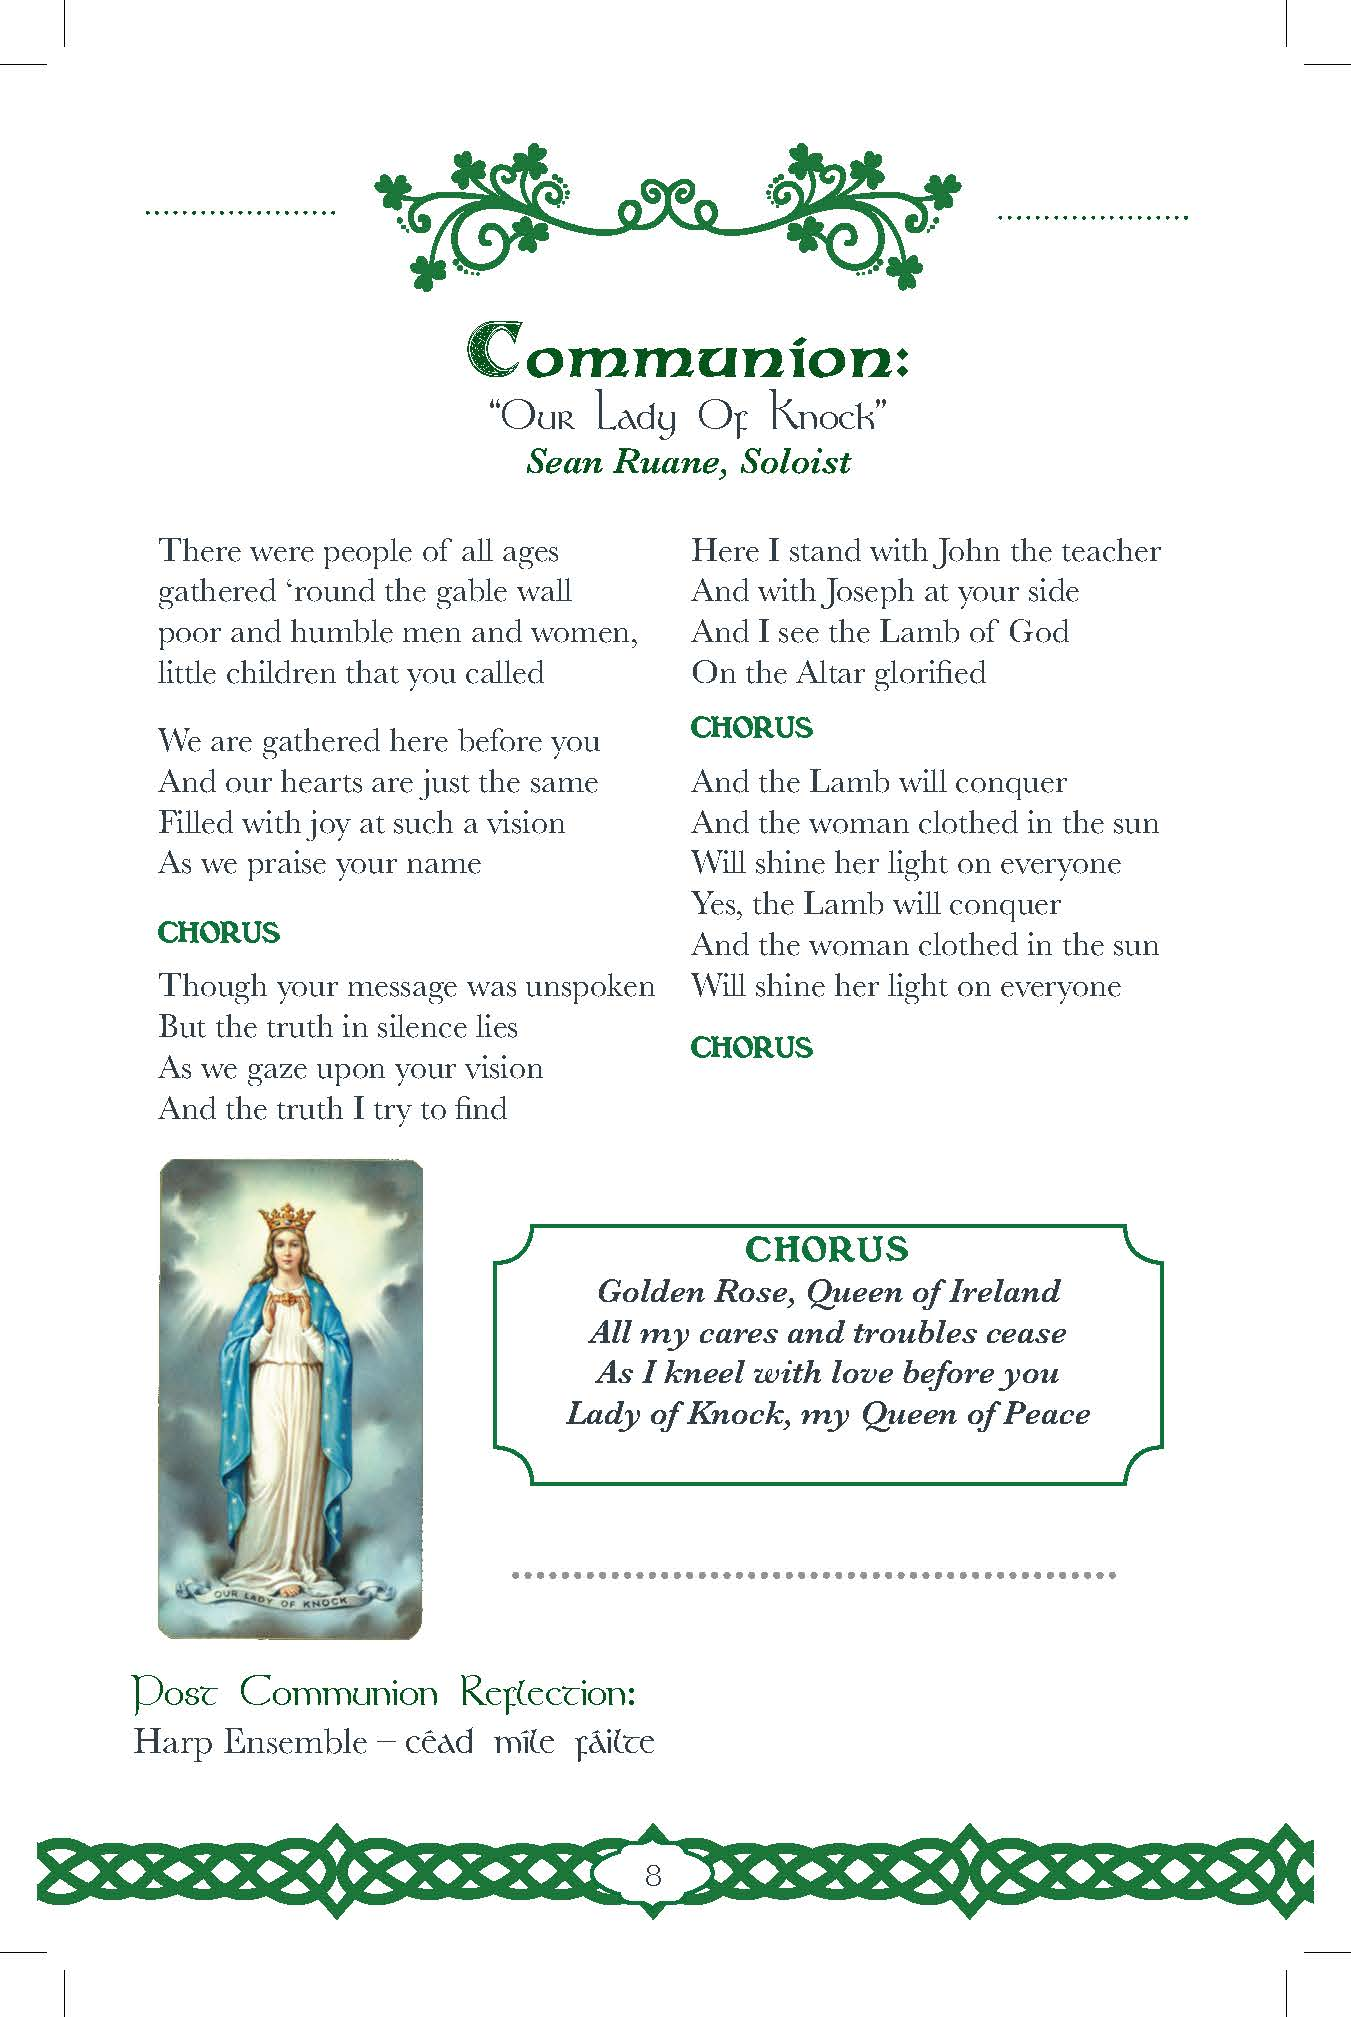 00000724 St.Barnabus_St.PatricksDay_FINALPRINT 1_Page_6.jpg